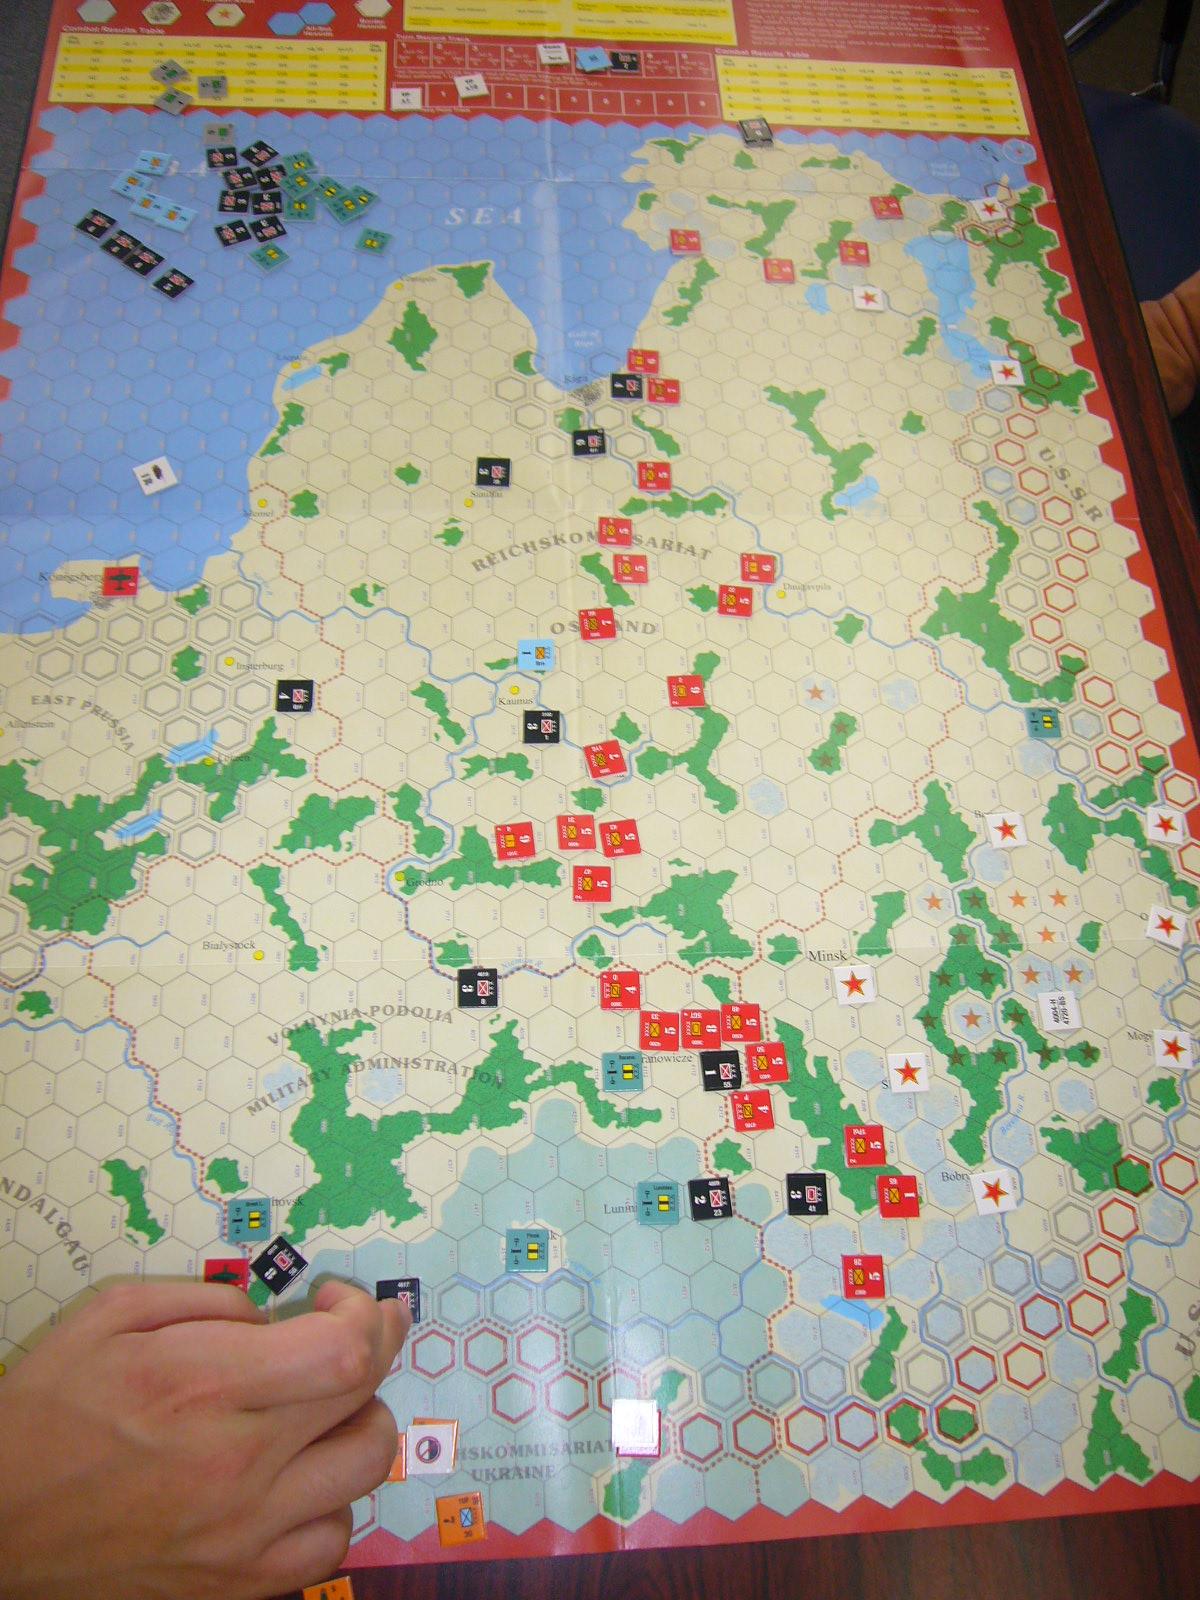 YSGA 7月例会の様子その5(WaW誌#9) Desruction of Army Group Center〉 _b0173672_18471222.jpg